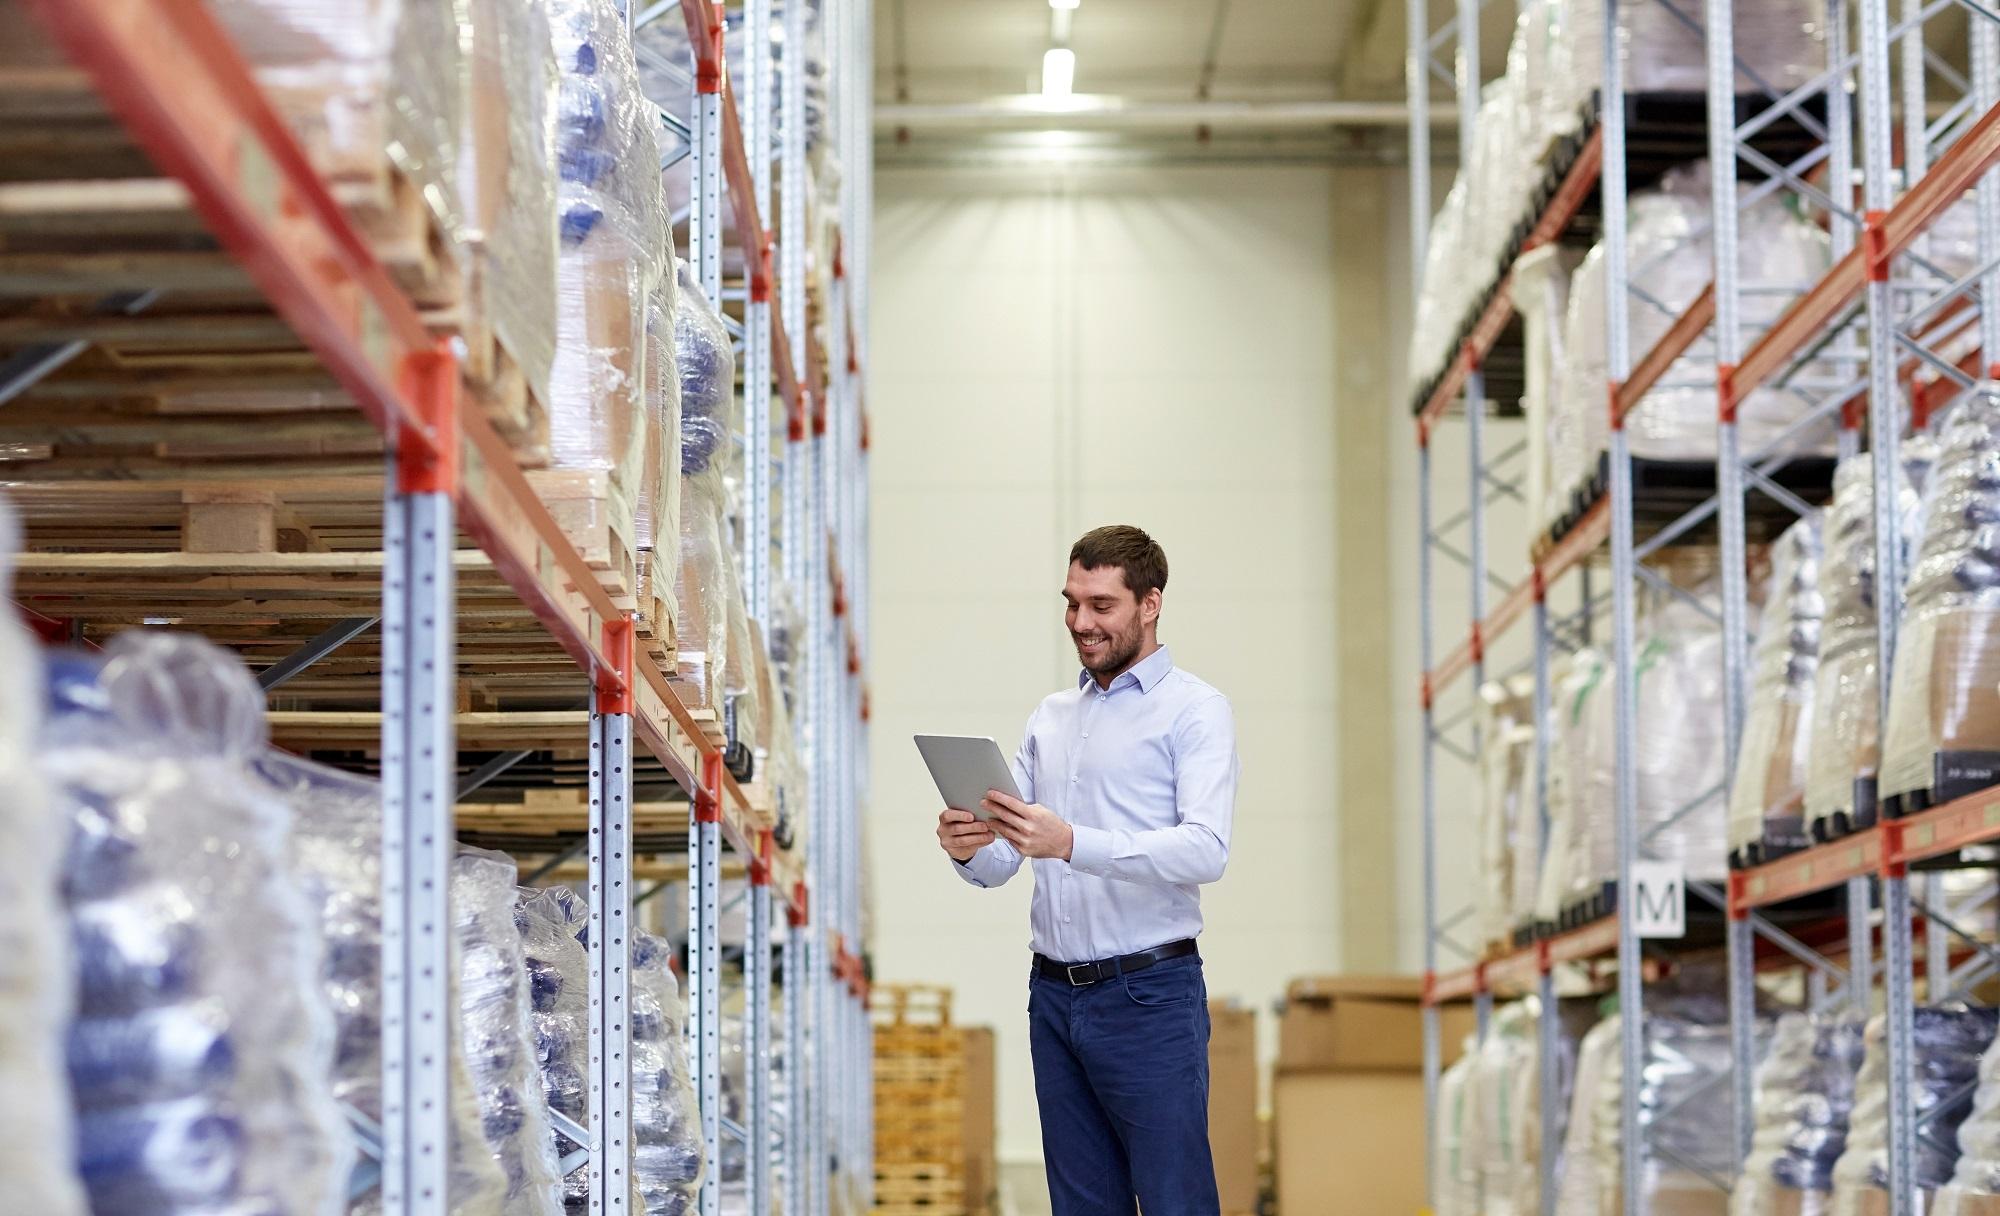 pervidi digital rack safety inspection